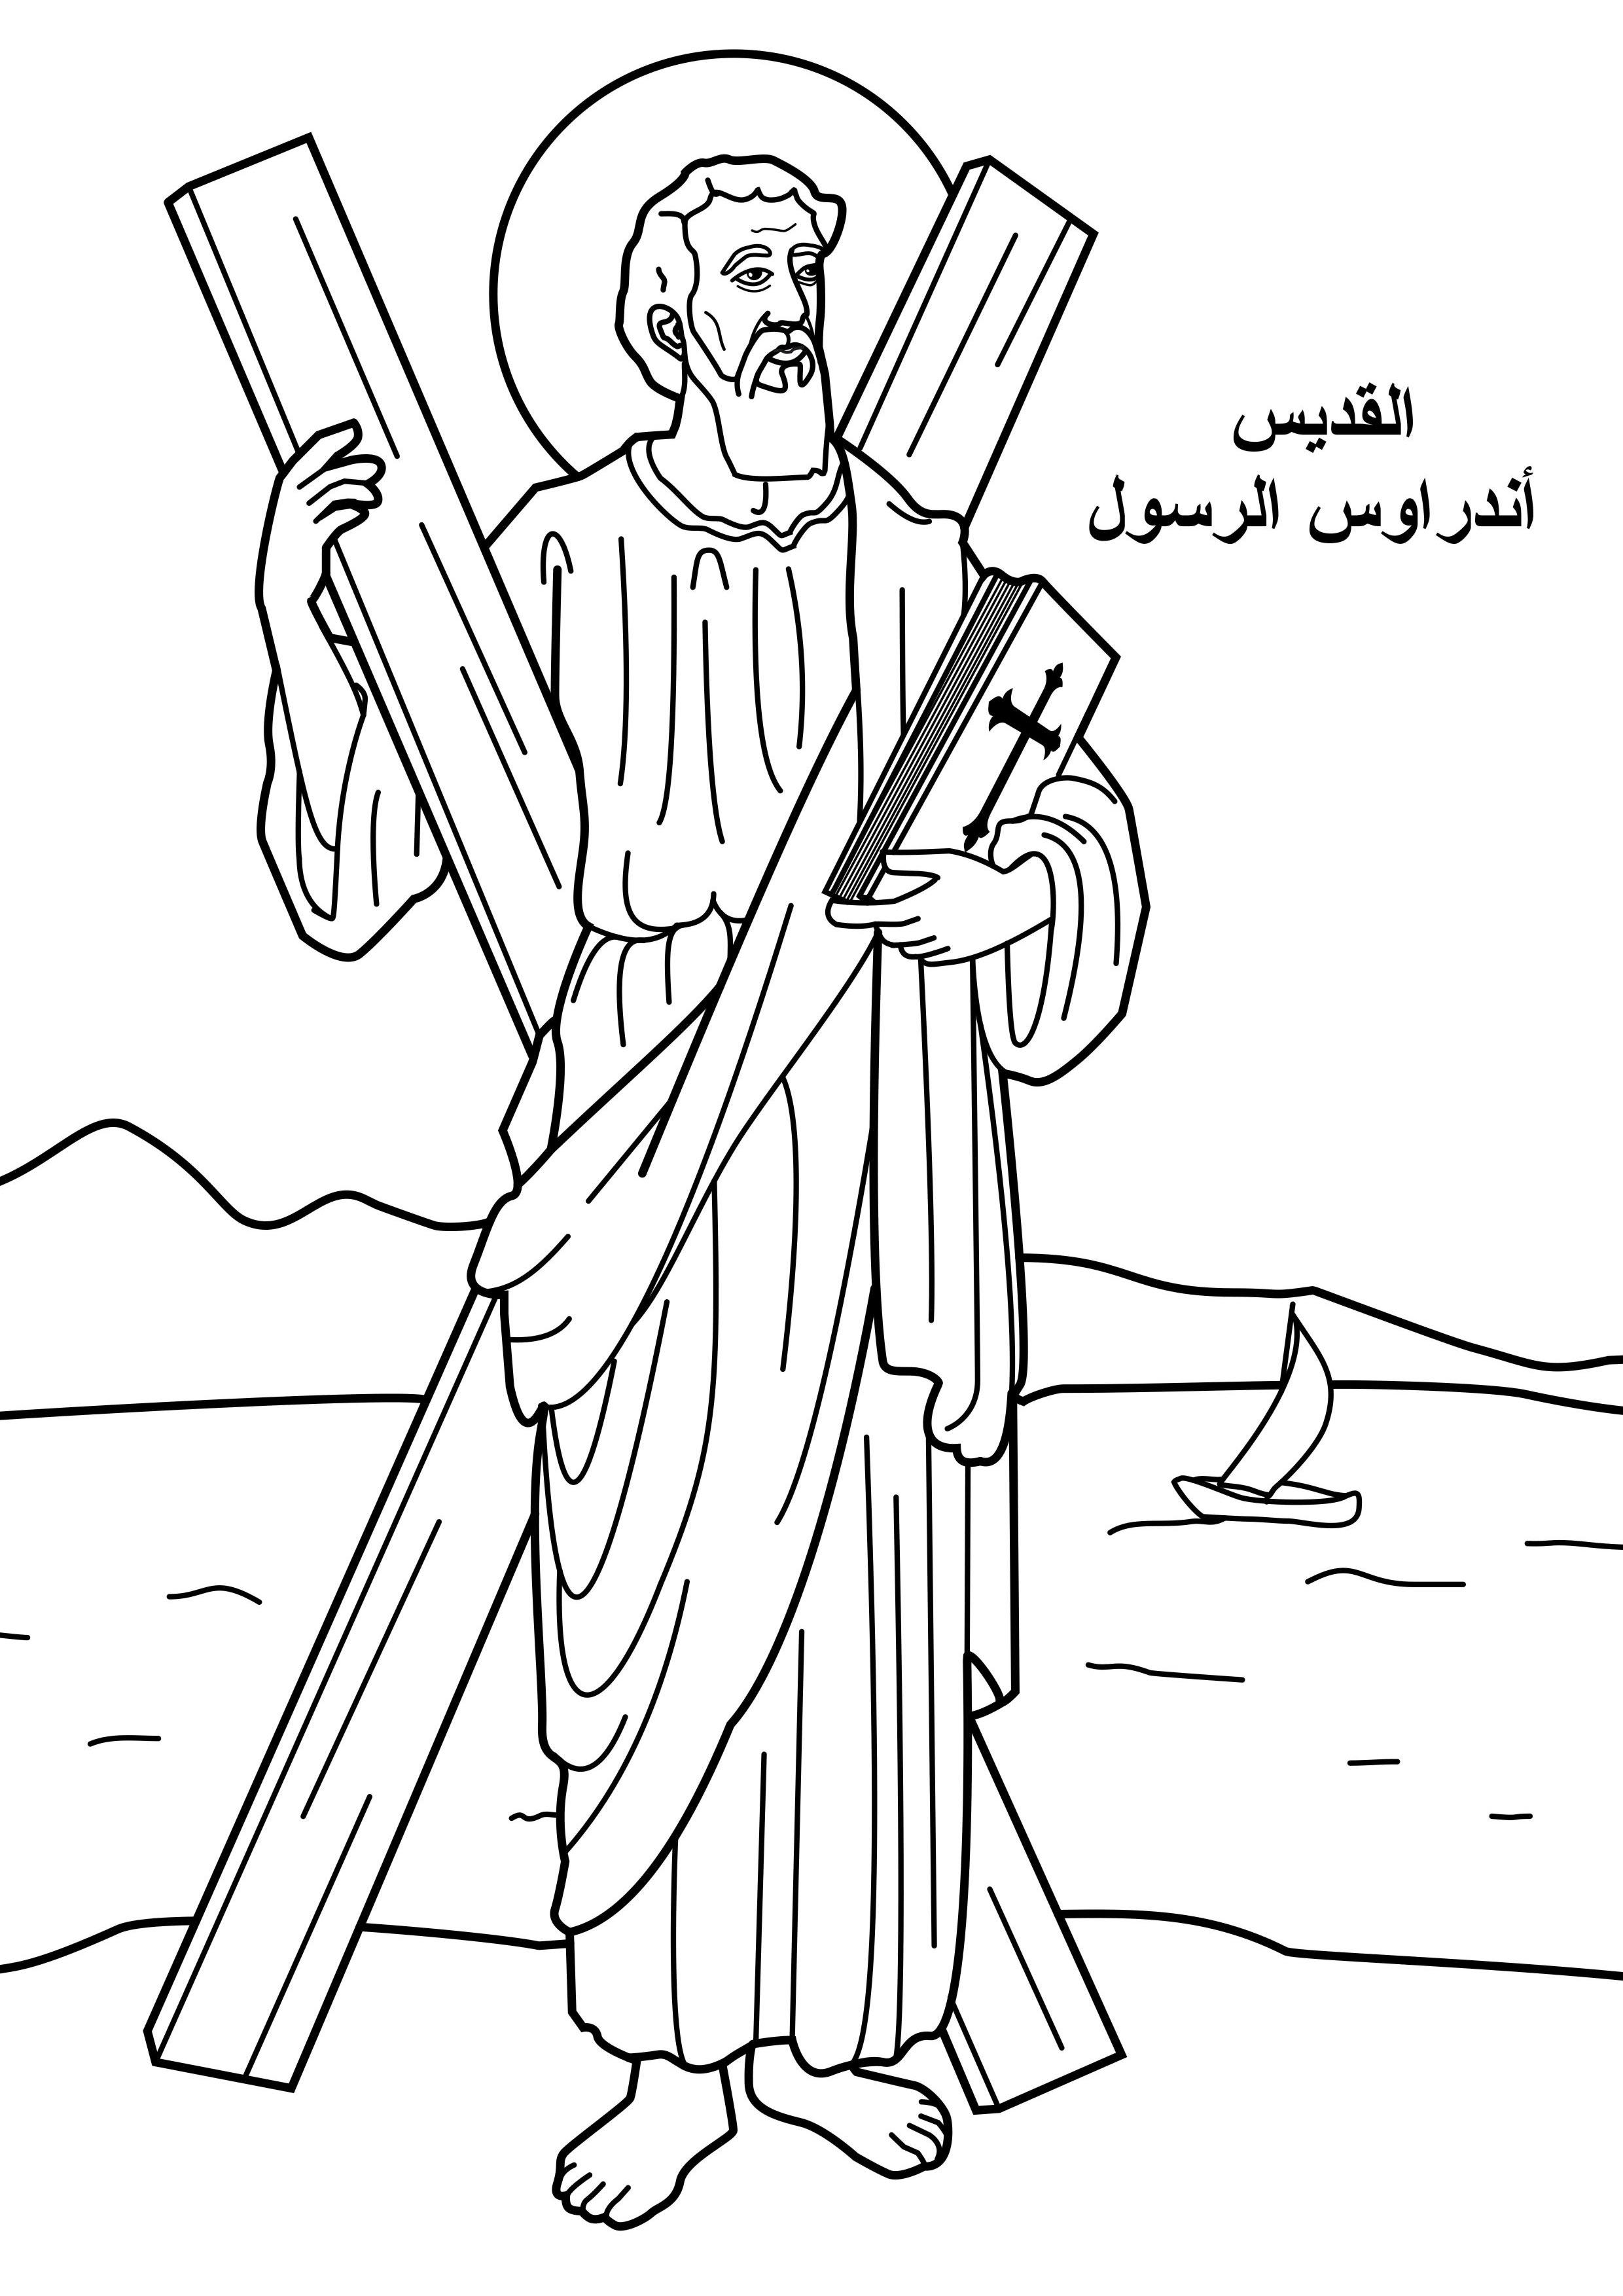 Image Coloring St Andrew The Apostle 1 صورة تلوين القديس